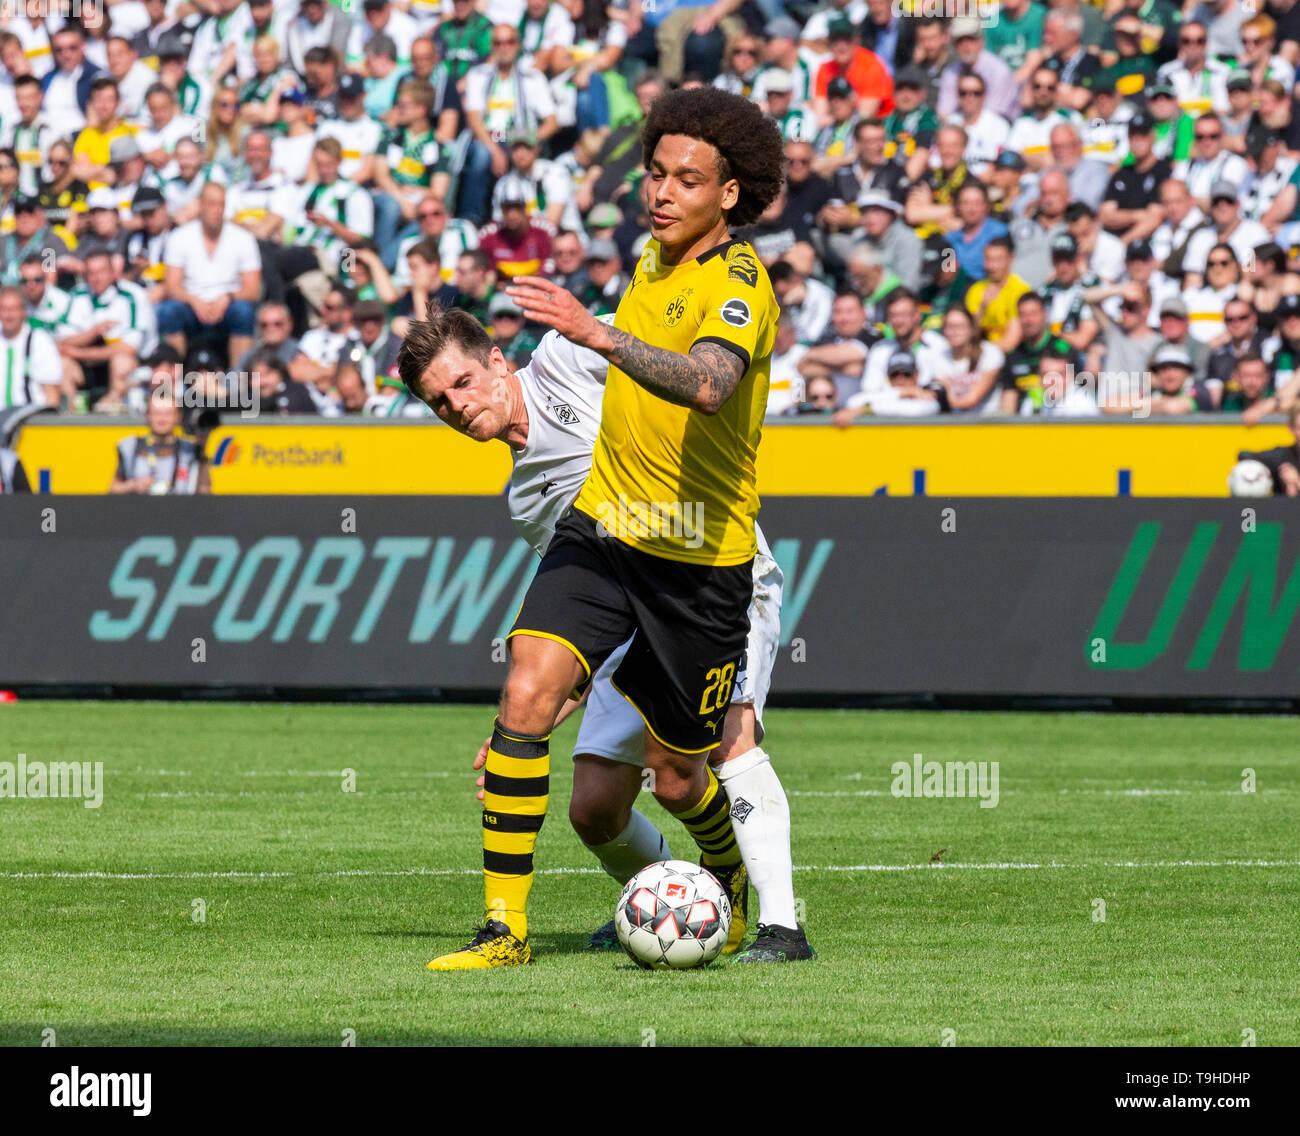 Sport, Fussball, Bundesliga, 2018/2019, Borussia Moenchengladbach vs. BVB Borussia Dortmund 0-2, Stadion Borussia-Park, Spielszene, Axel Witsel (BVB) vorn, dahinter Jonas Hofmann (MG), DFL REGULATIONS PROHIBIT ANY USE OF PHOTOGRAPHS AS IMAGE SEQUENCES AND/OR QUASI-VIDEO, sports, football, Bundesliga, 2018/2019, Borussia Moenchengladbach vs. BVB Borussia Dortmund 0-2, Stadium Borussia Park, scene of the match, Axel Witsel (BVB) ahead, behind Jonas Hofmann (MG), DFL REGULATIONS PROHIBIT ANY USE OF PHOTOGRAPHS AS IMAGE SEQUENCES AND/OR QUASI-VIDEO *** Local Caption *** sports, football, Bundeslig - Stock Image